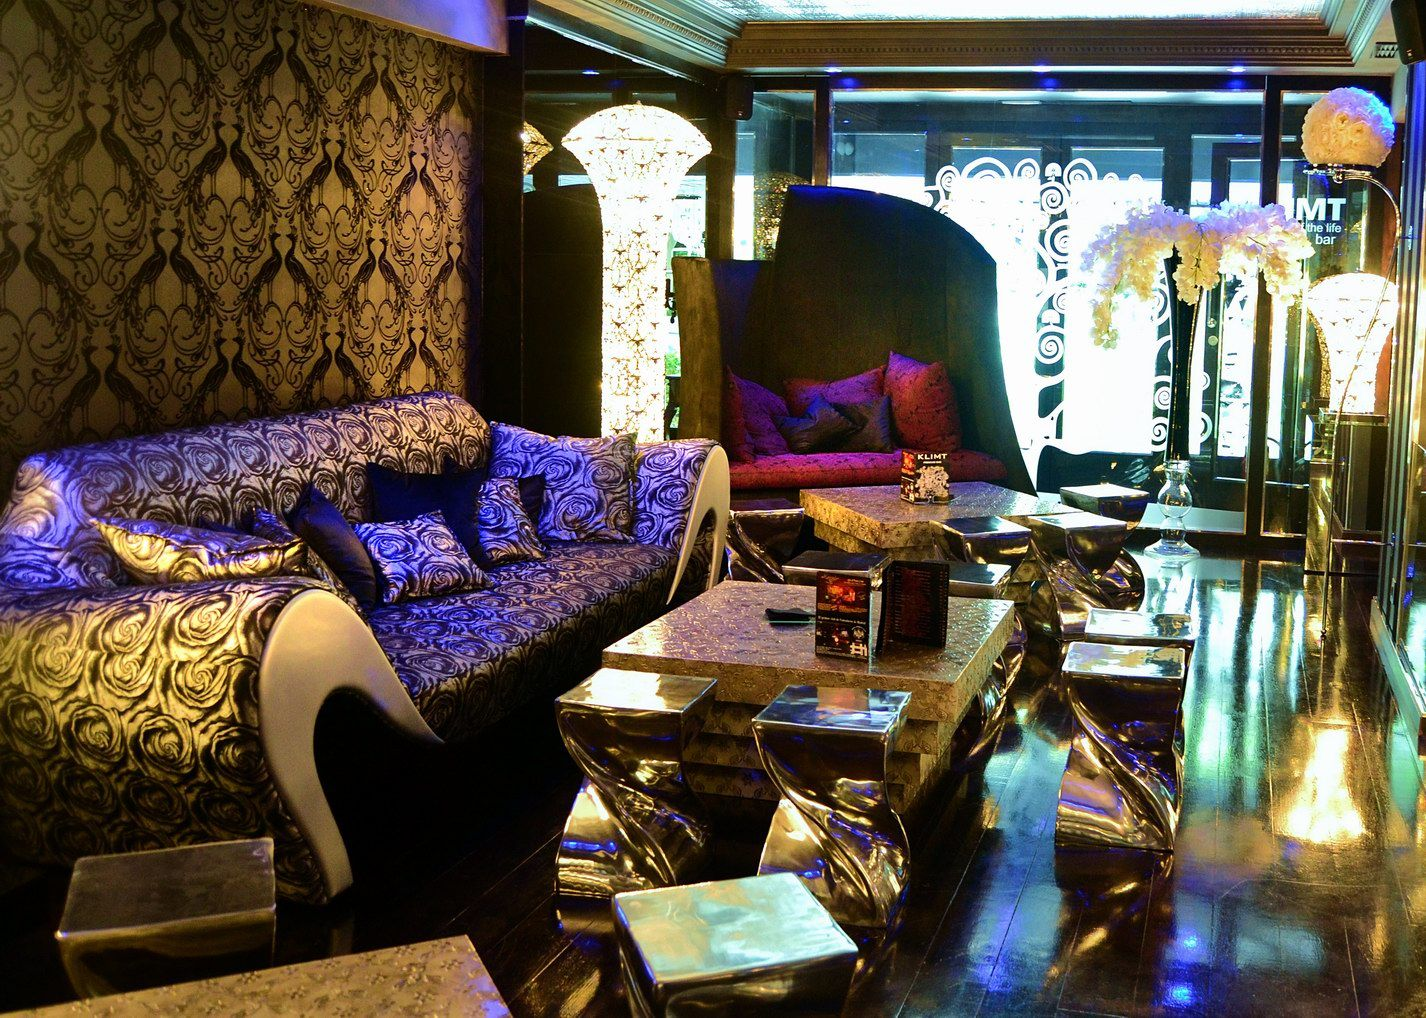 Newwd decoracion de bares tematicos klimt madrid decoracion moderna bar la choza pinterest - Decoracion bares tematicos ...